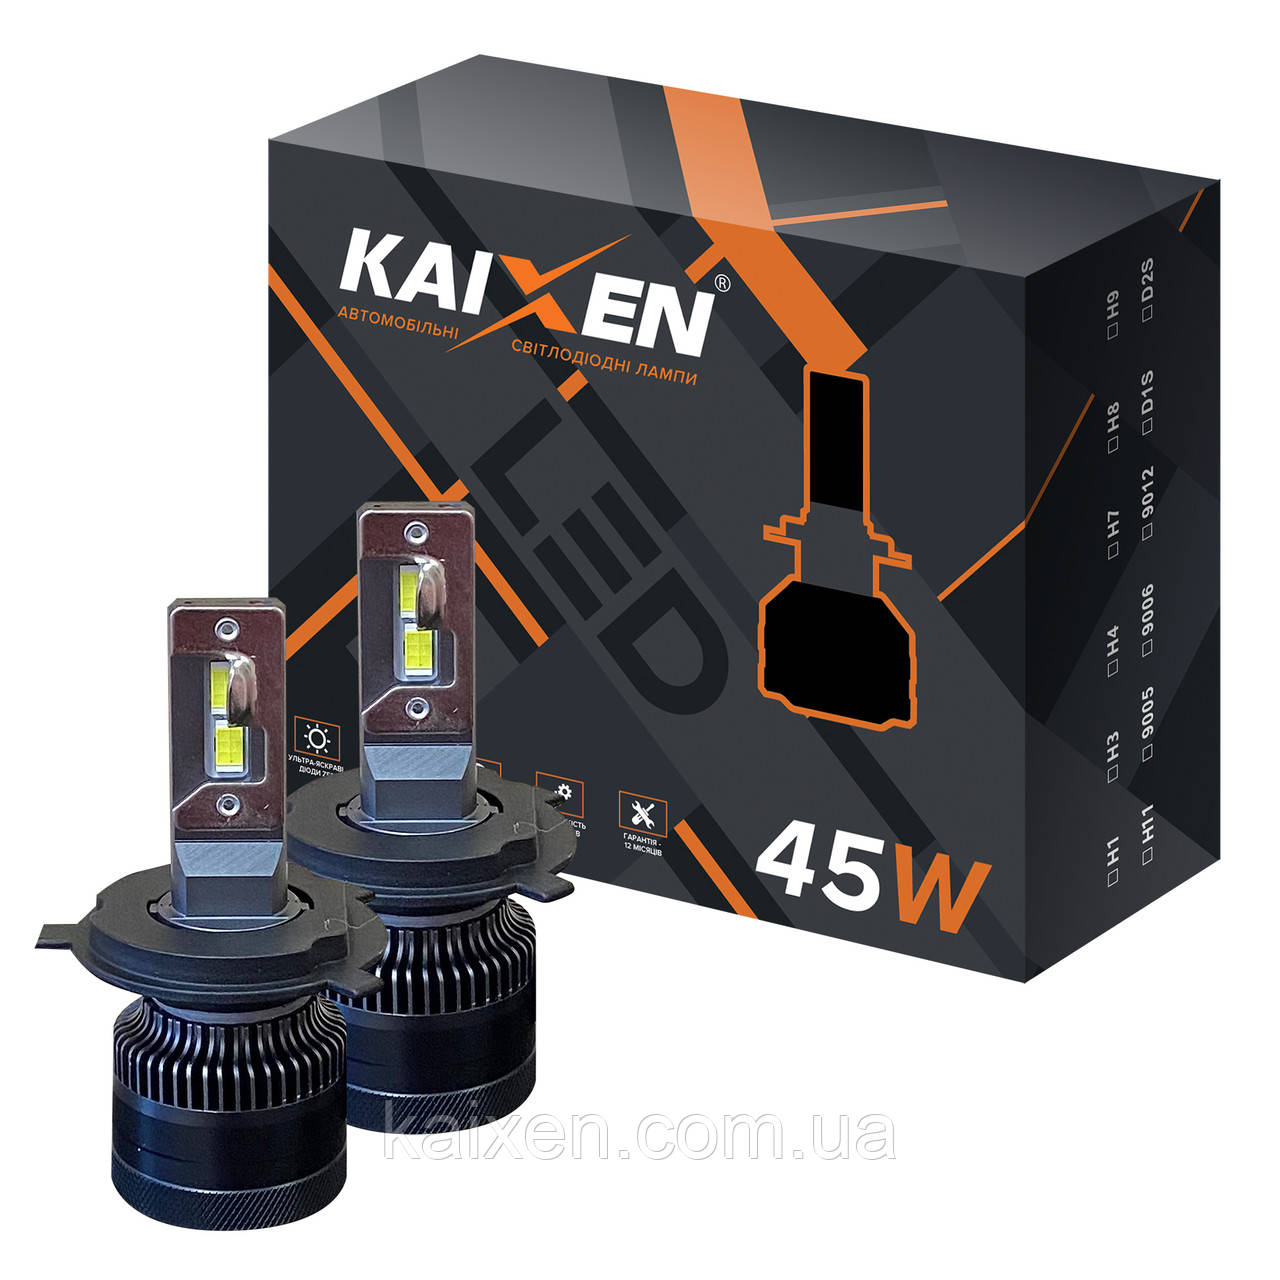 Світлодіодні лампи H4 KAIXEN K7 (45W-6000K-CANBUS)